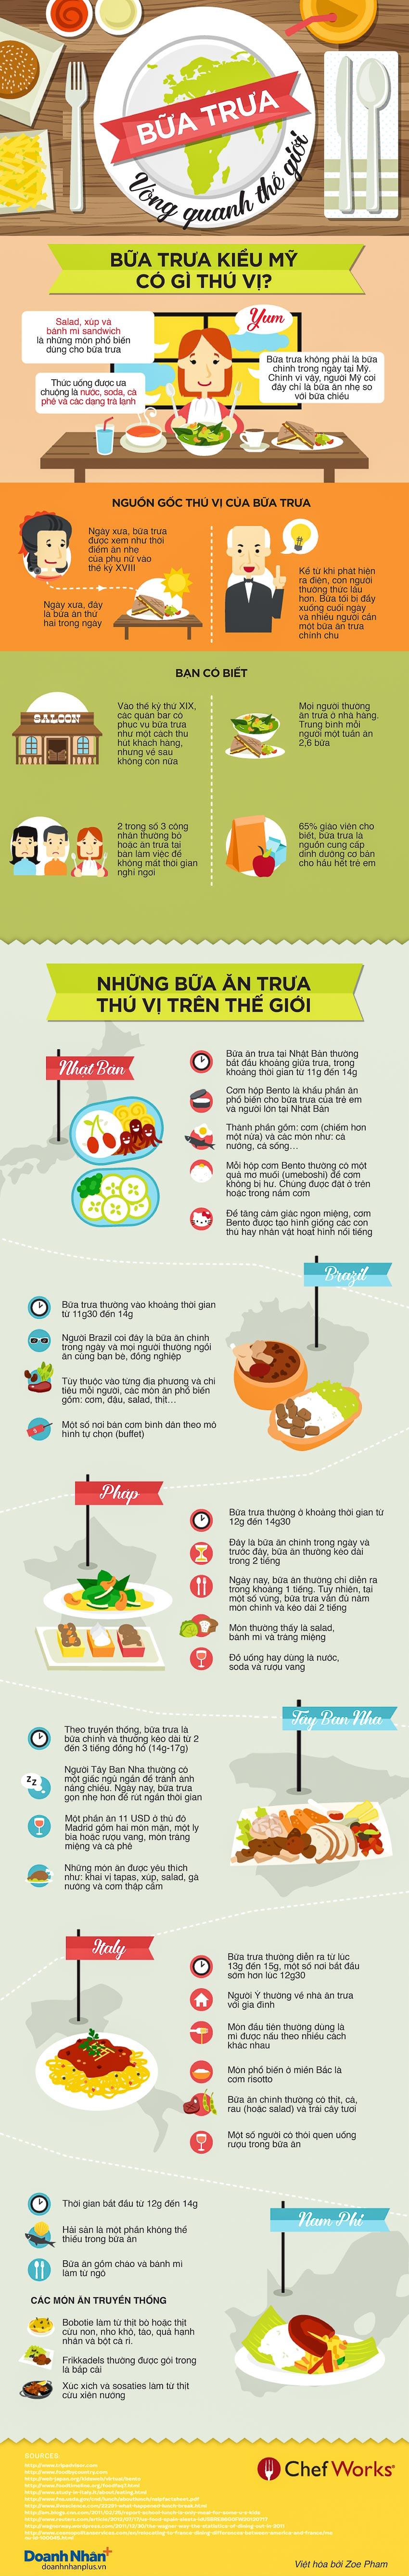 Infographic-bua-trua-thu-vi-cua-cac-quoc-gia-tren-the-gioi